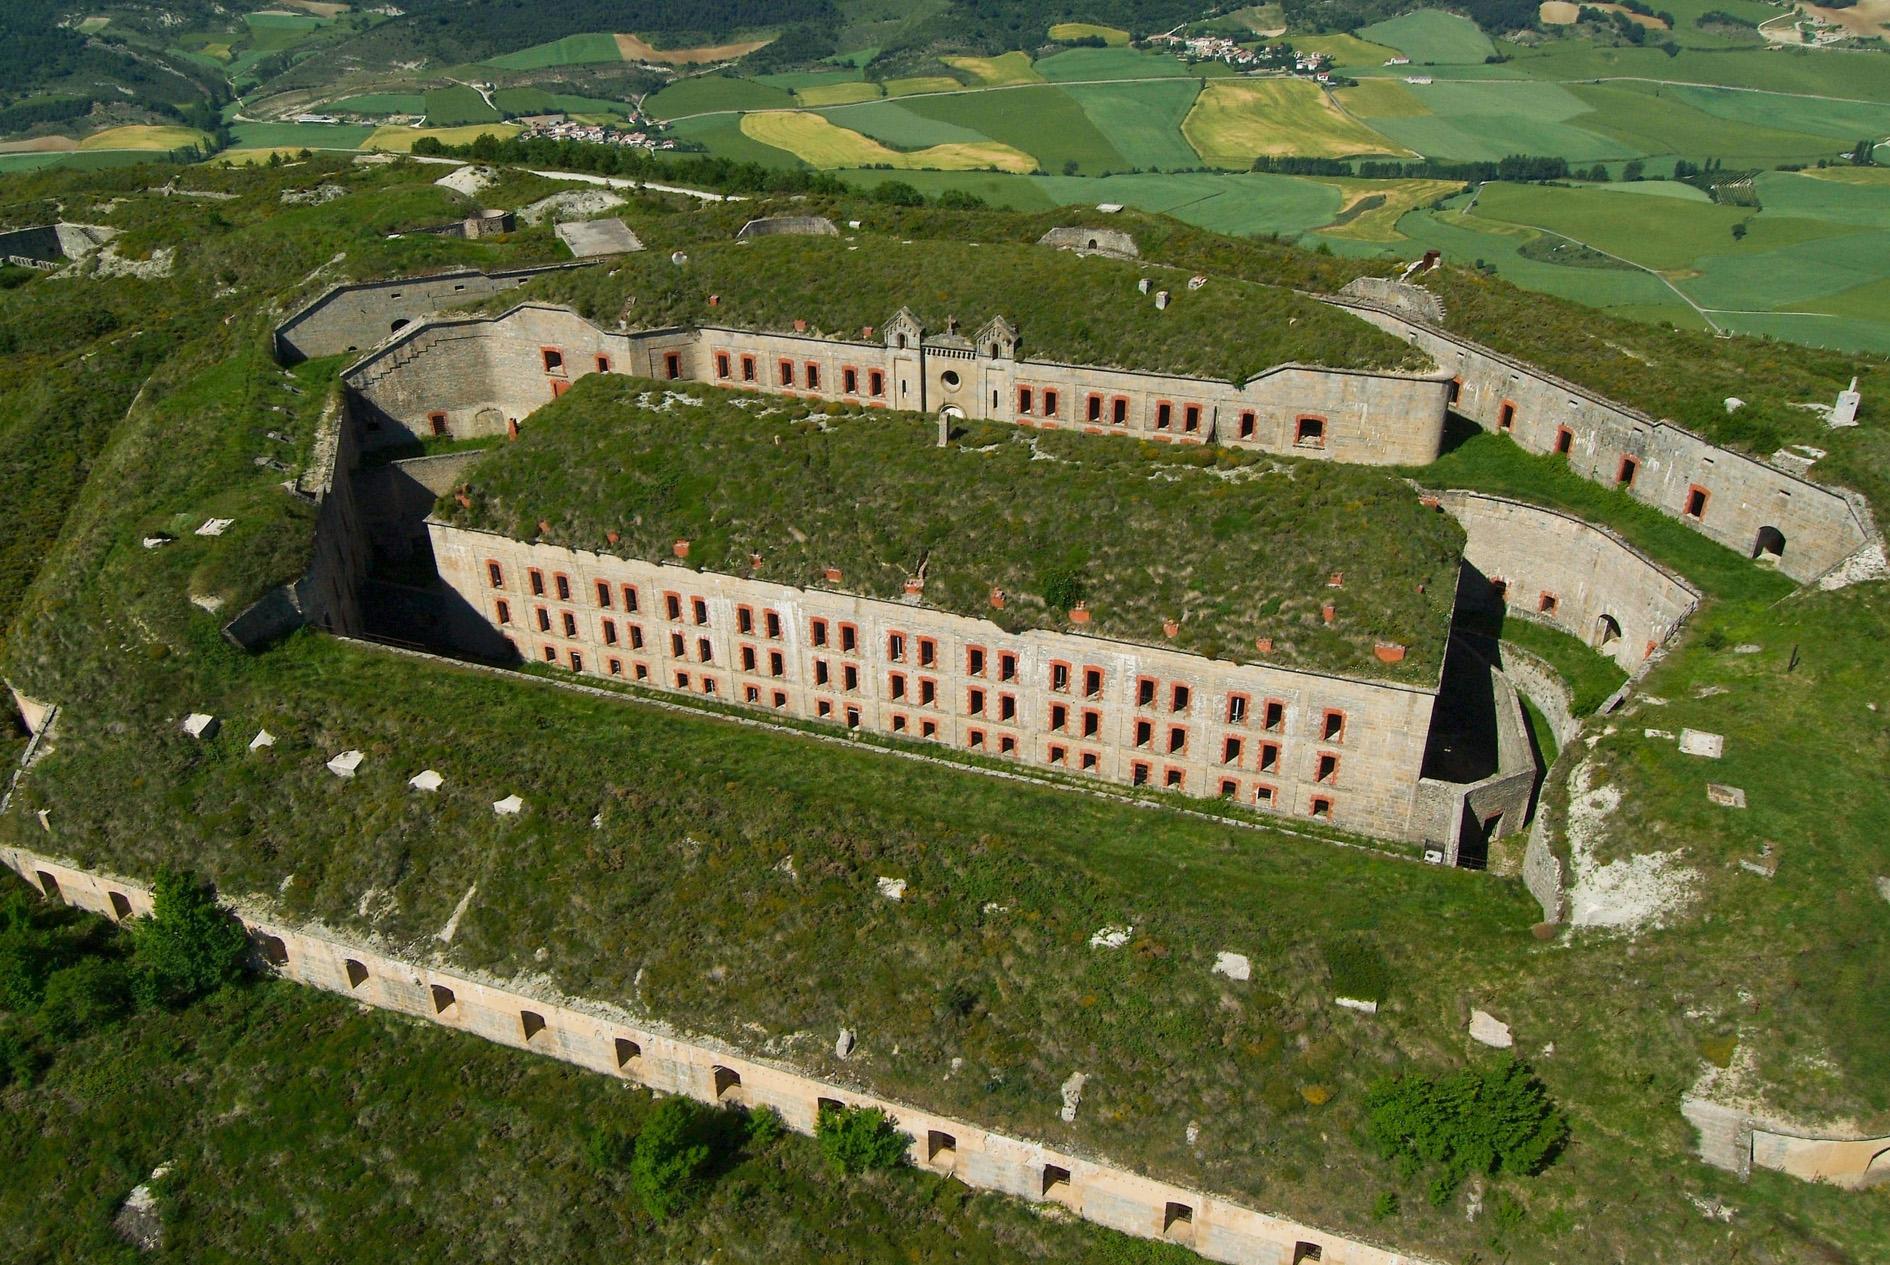 Fuerte de San Cristobal, foto www.lugaresconhistoria.com